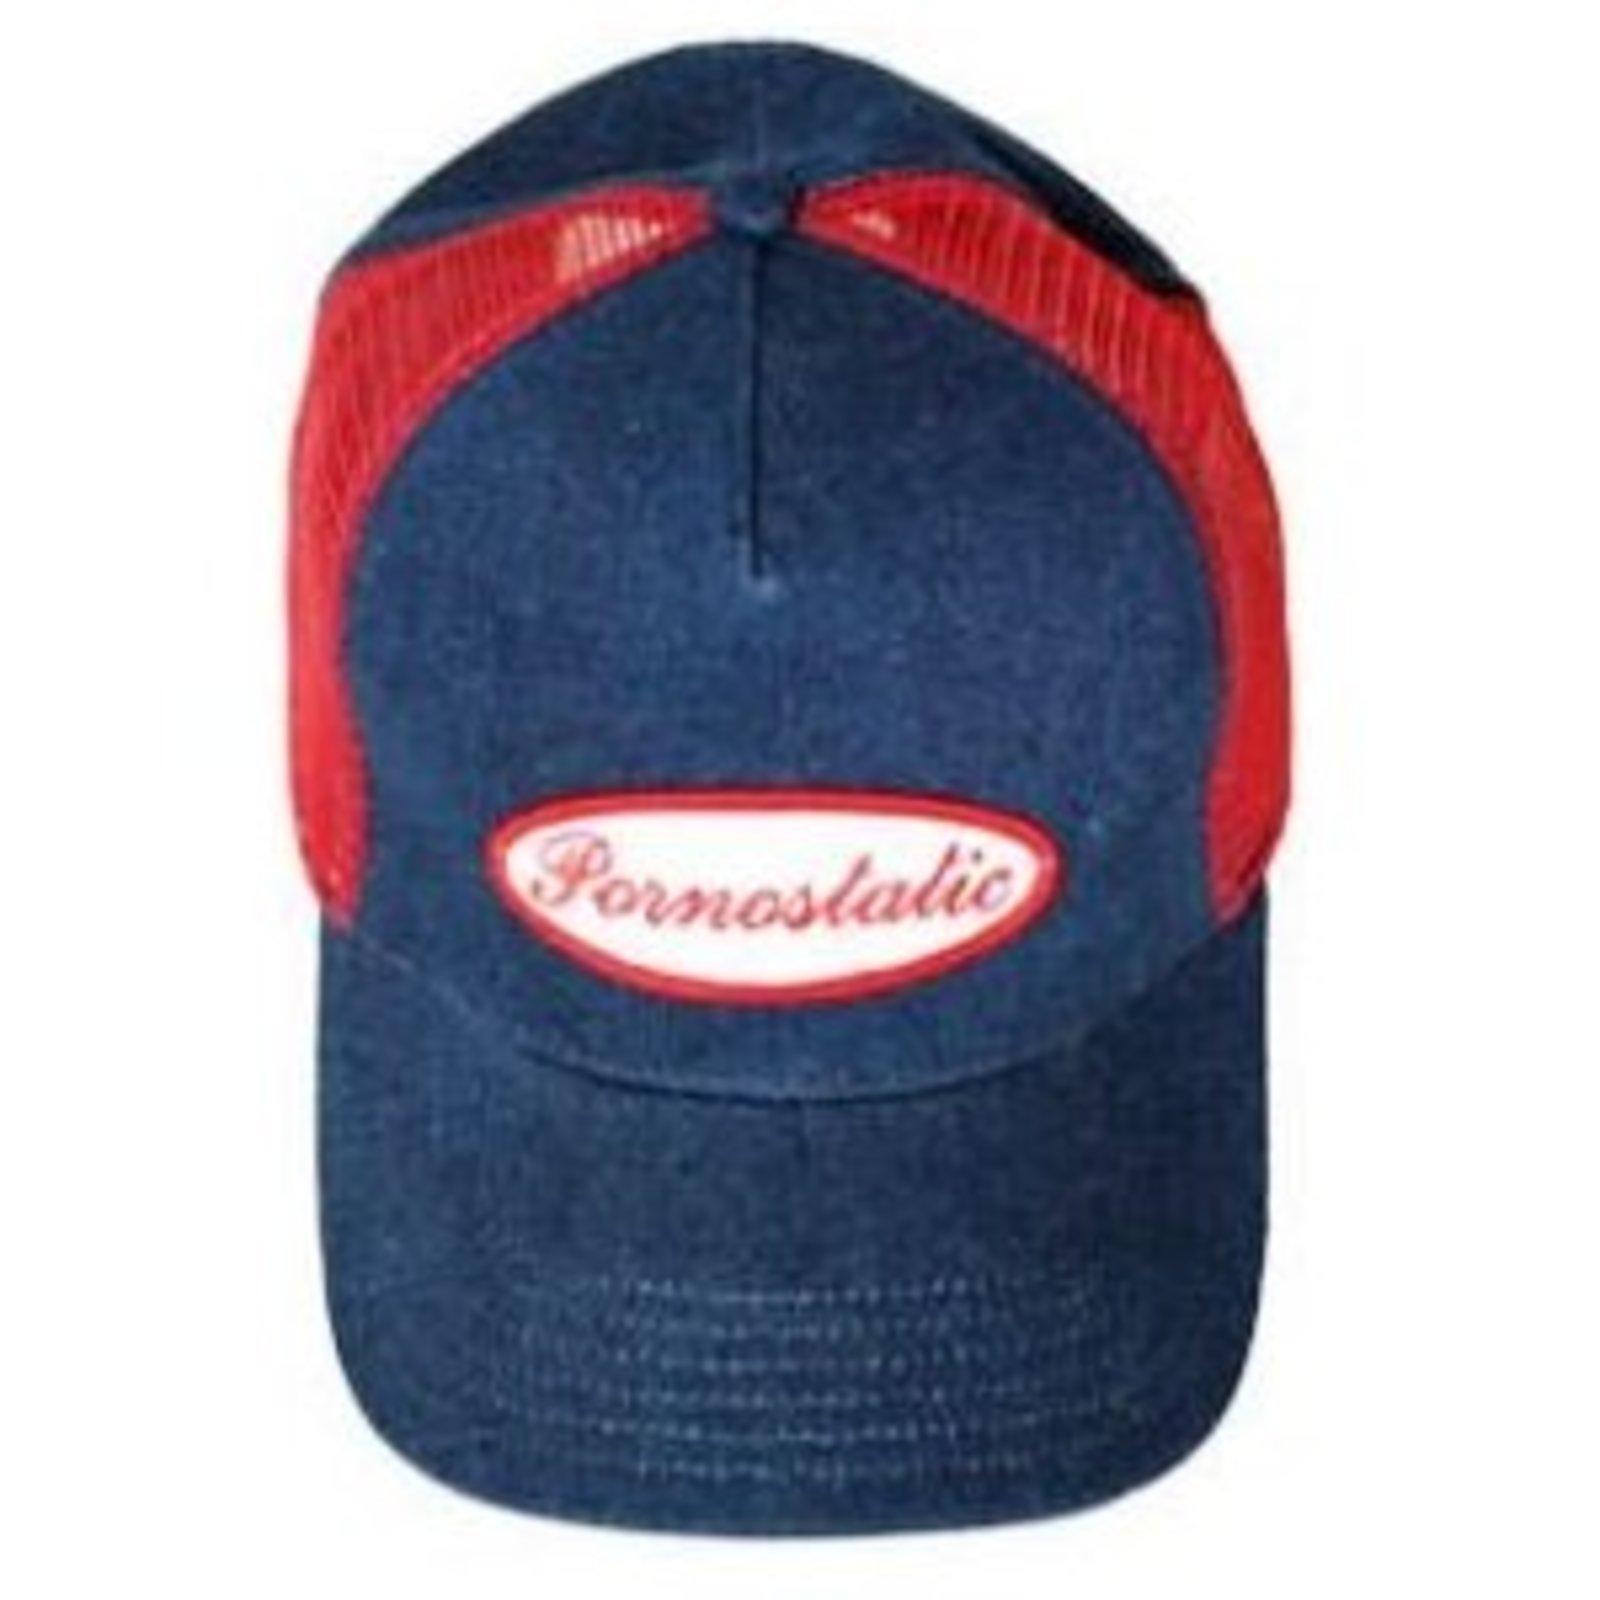 efa70e92026 Pornostatic cap Denim trucker cap at Togged Clothing